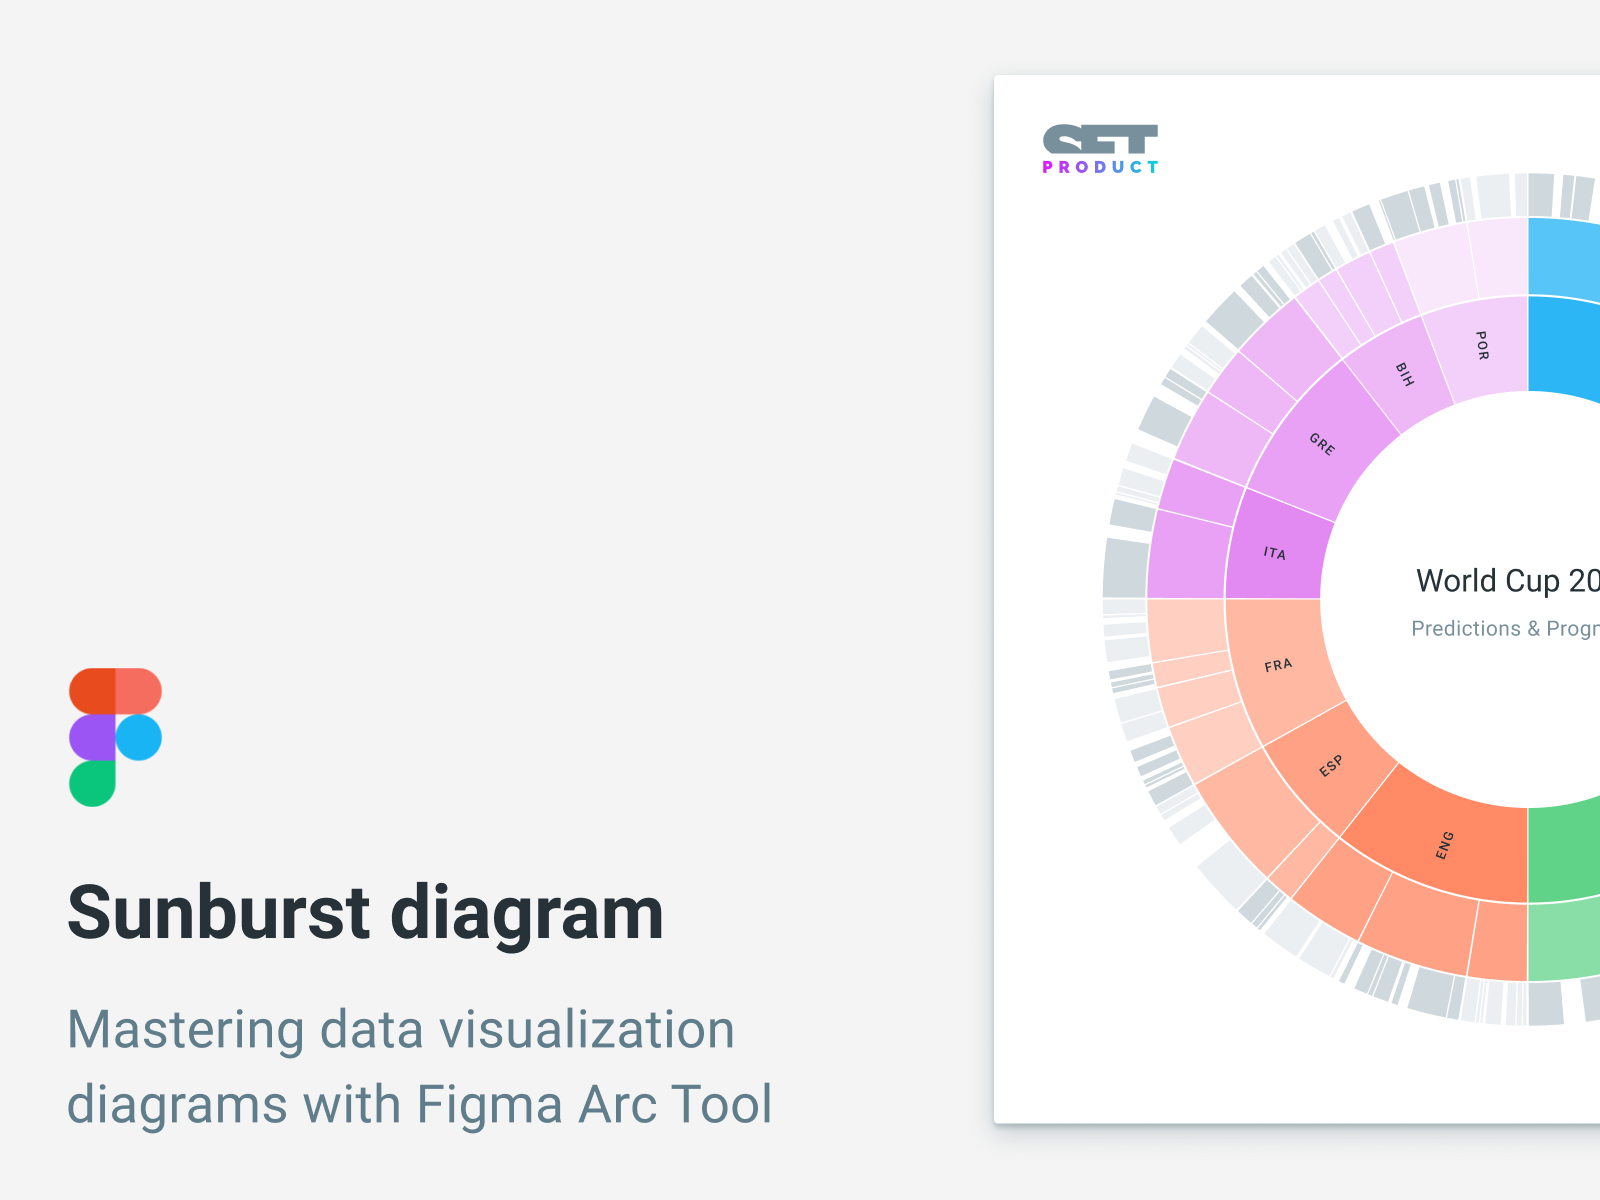 Sunburst diagram data visualization library